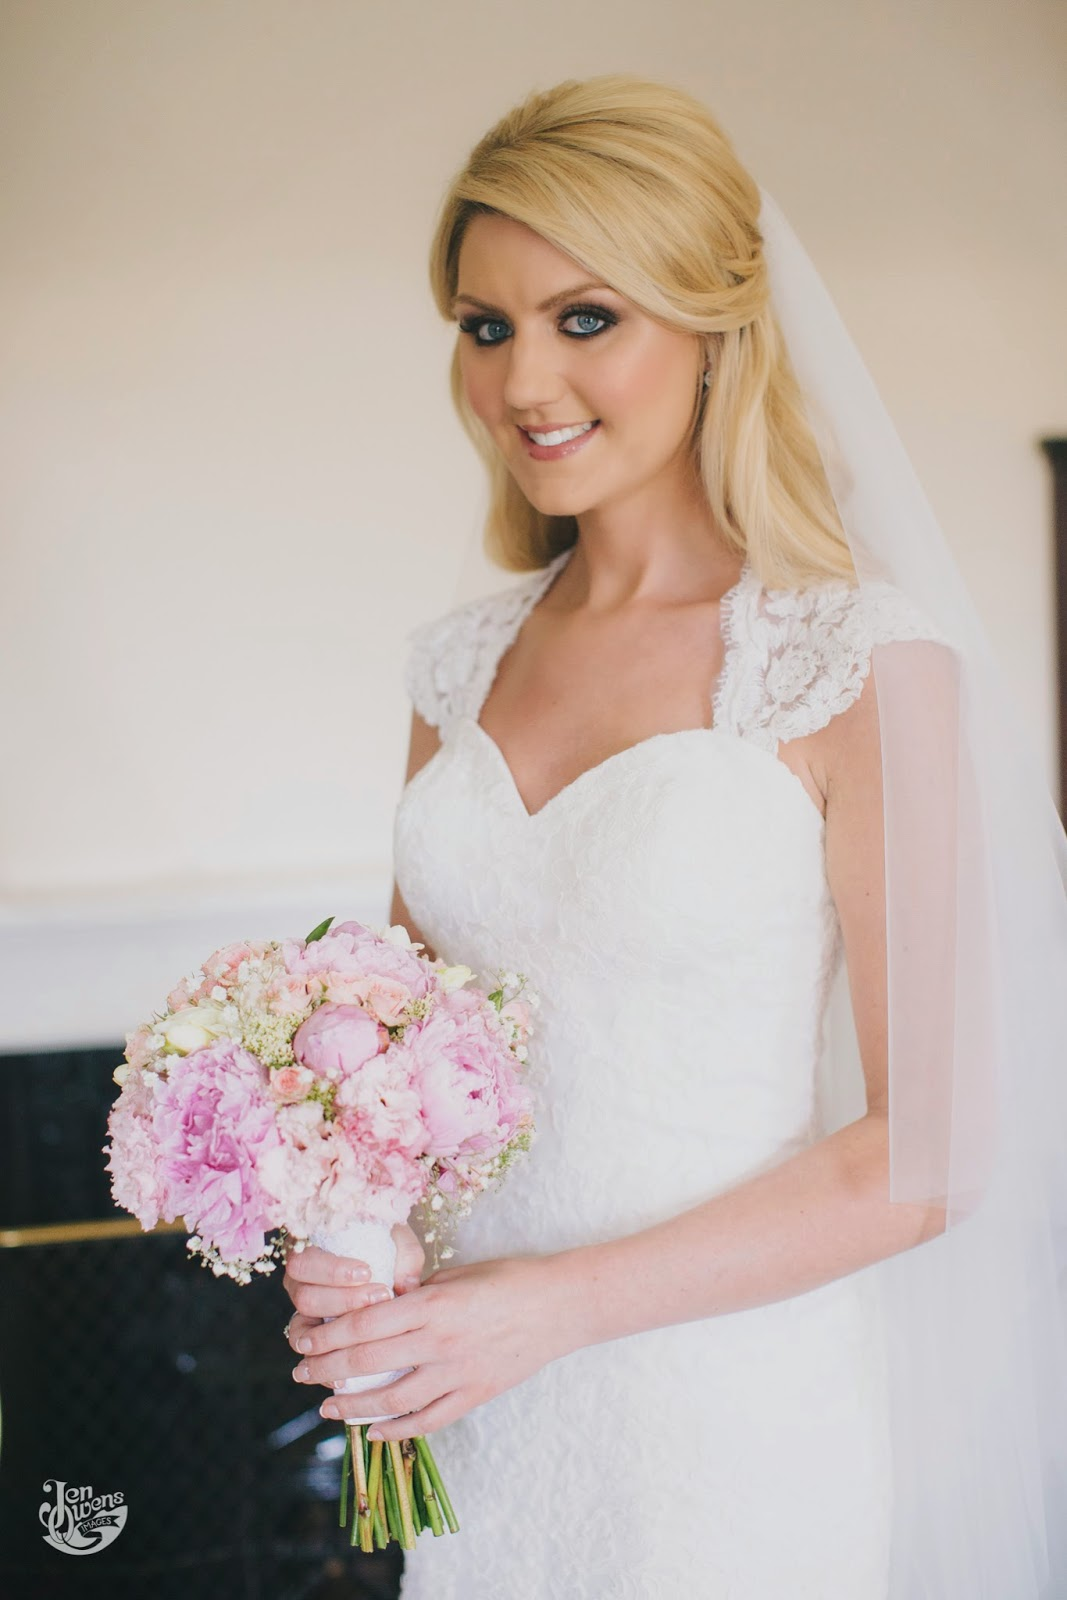 Louise Chrystal - Hair: Wedding Hairstyles